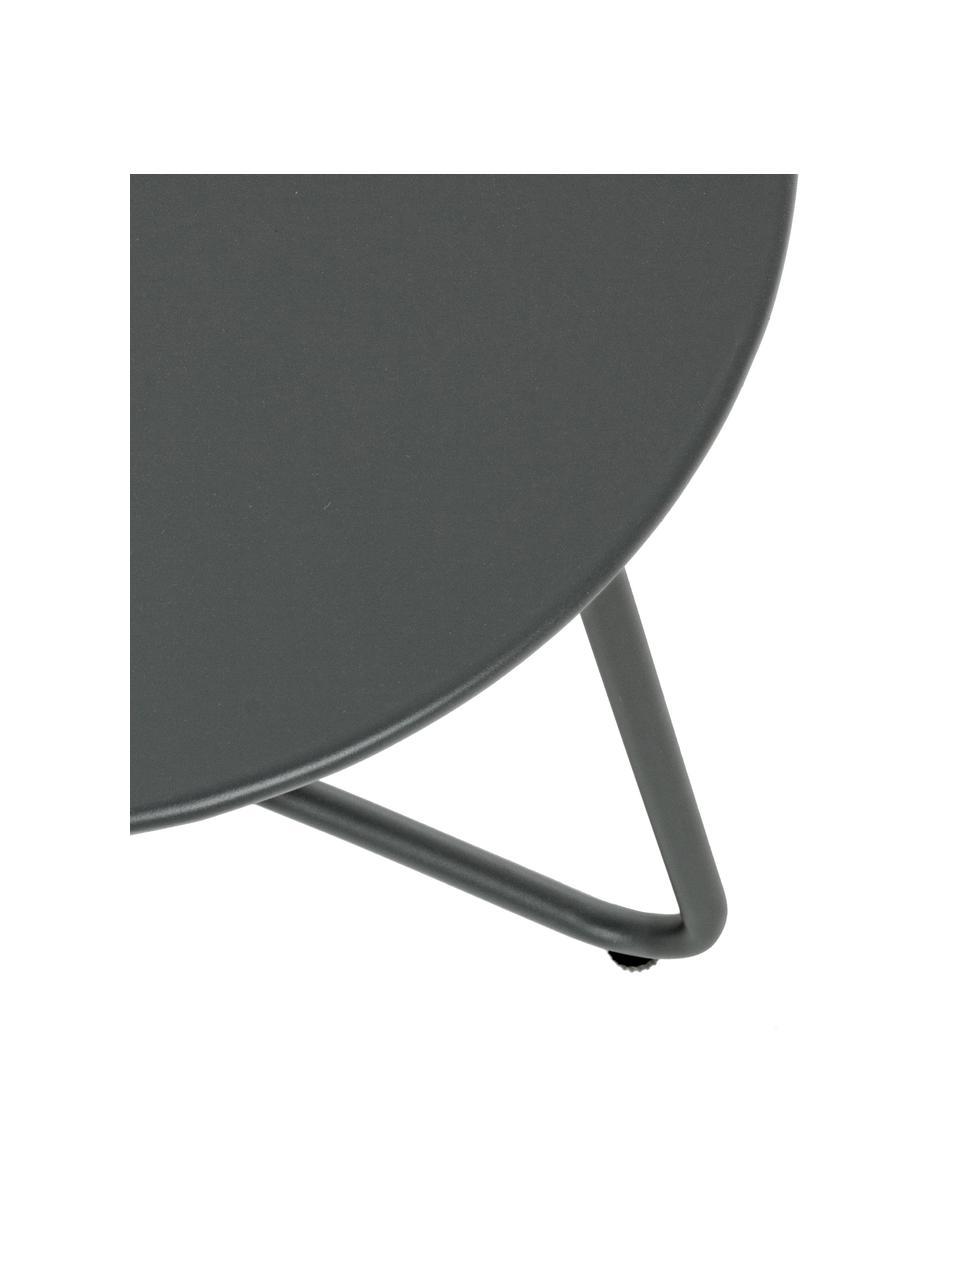 Metall-Gartenbeistelltisch Wissant in Dunkelgrau, Stahl, pulverbeschichtet, Dunkelgrau, Ø 40 x H 45 cm